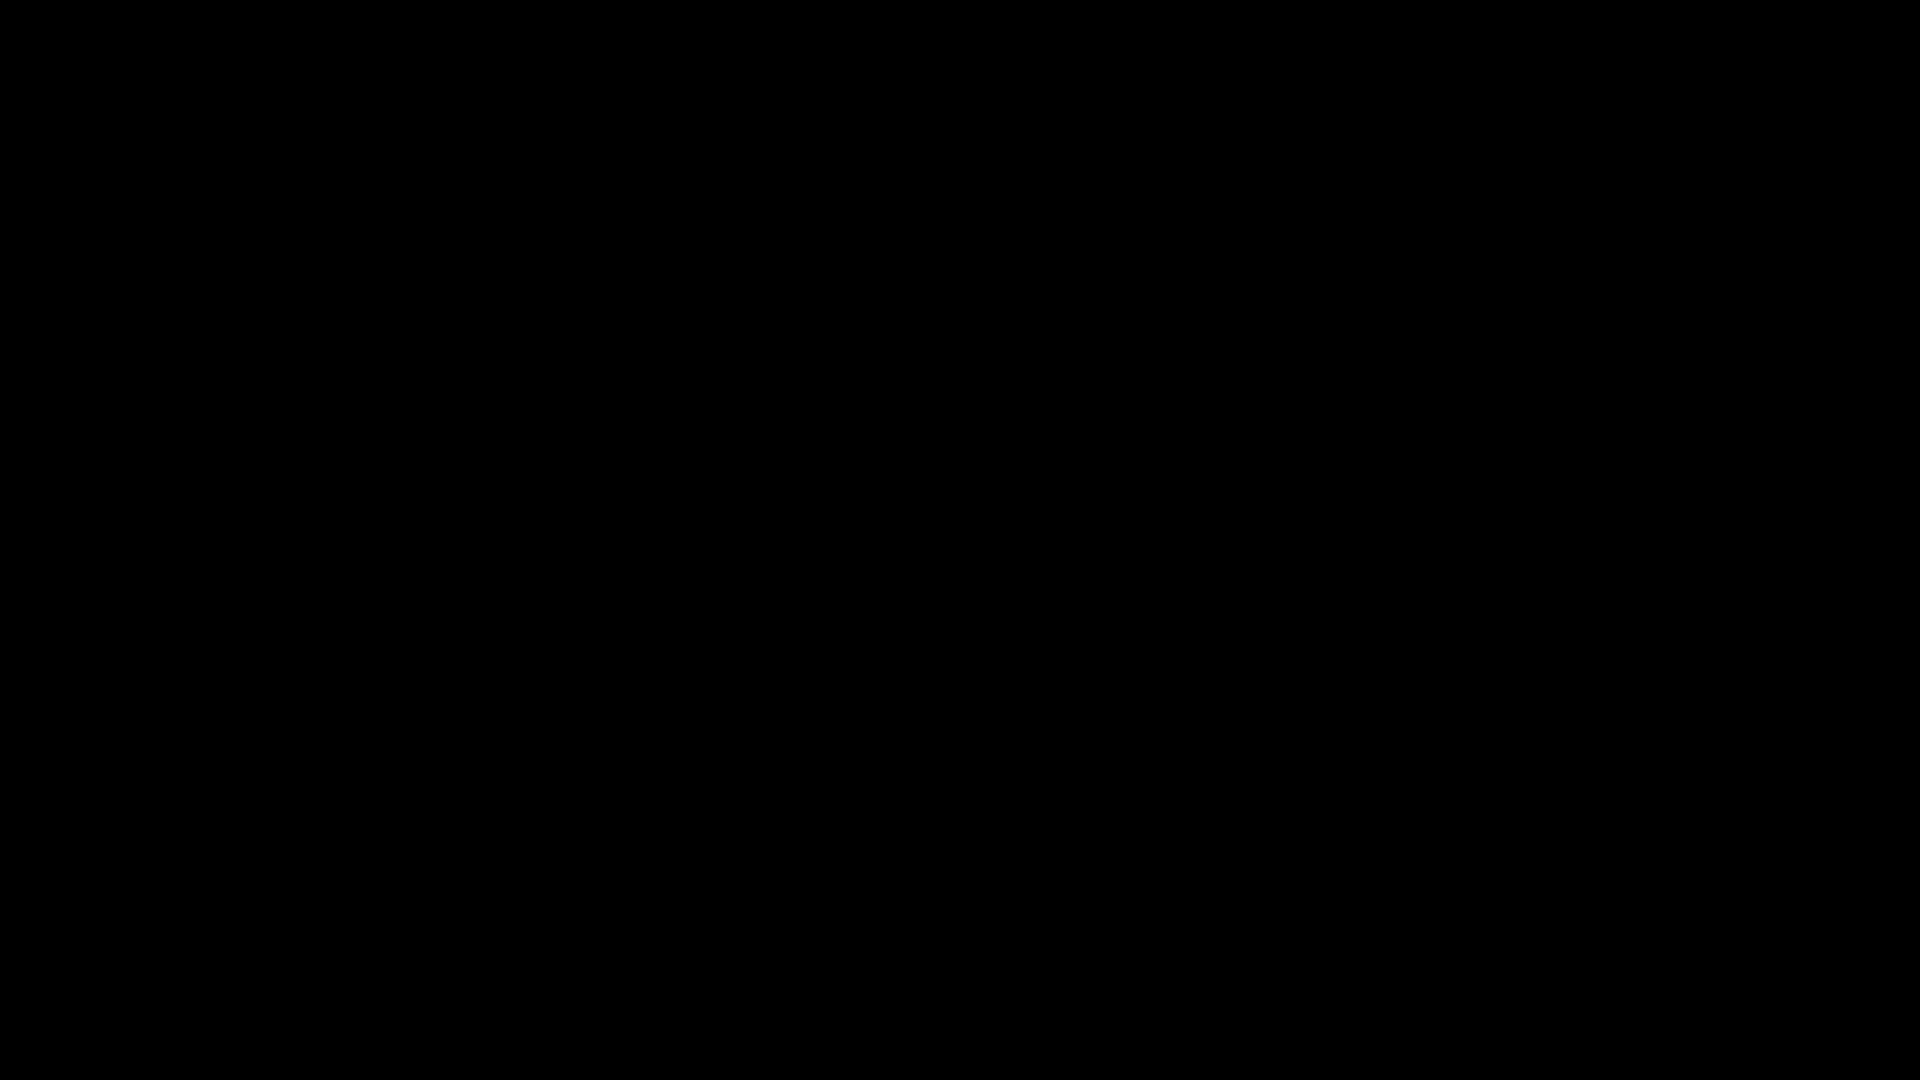 000000 pure black wallpaper 70452